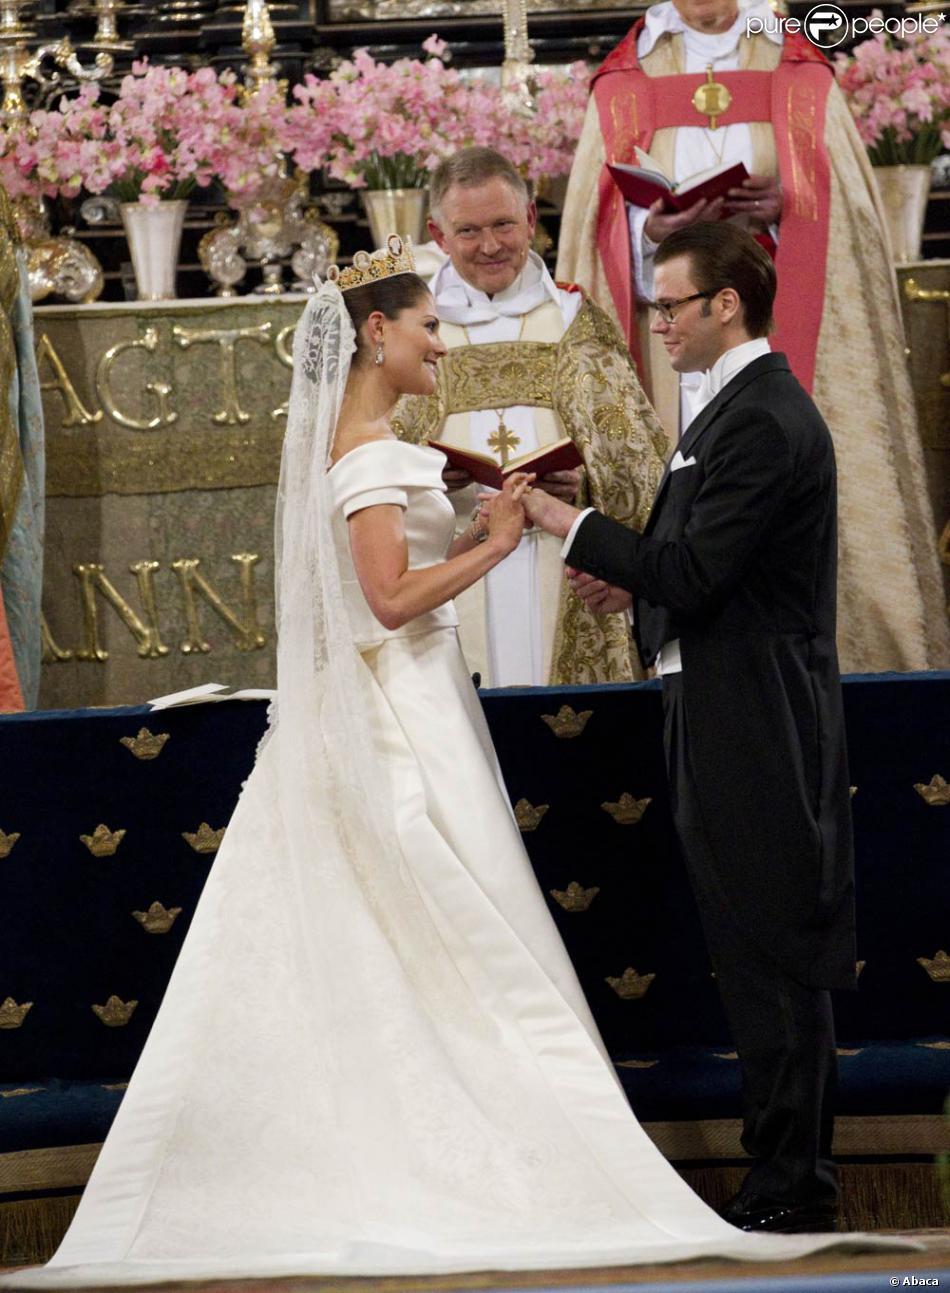 samedi 19 juin 2010 la princesse h riti re victoria de su de et le roturier daniel westling se. Black Bedroom Furniture Sets. Home Design Ideas